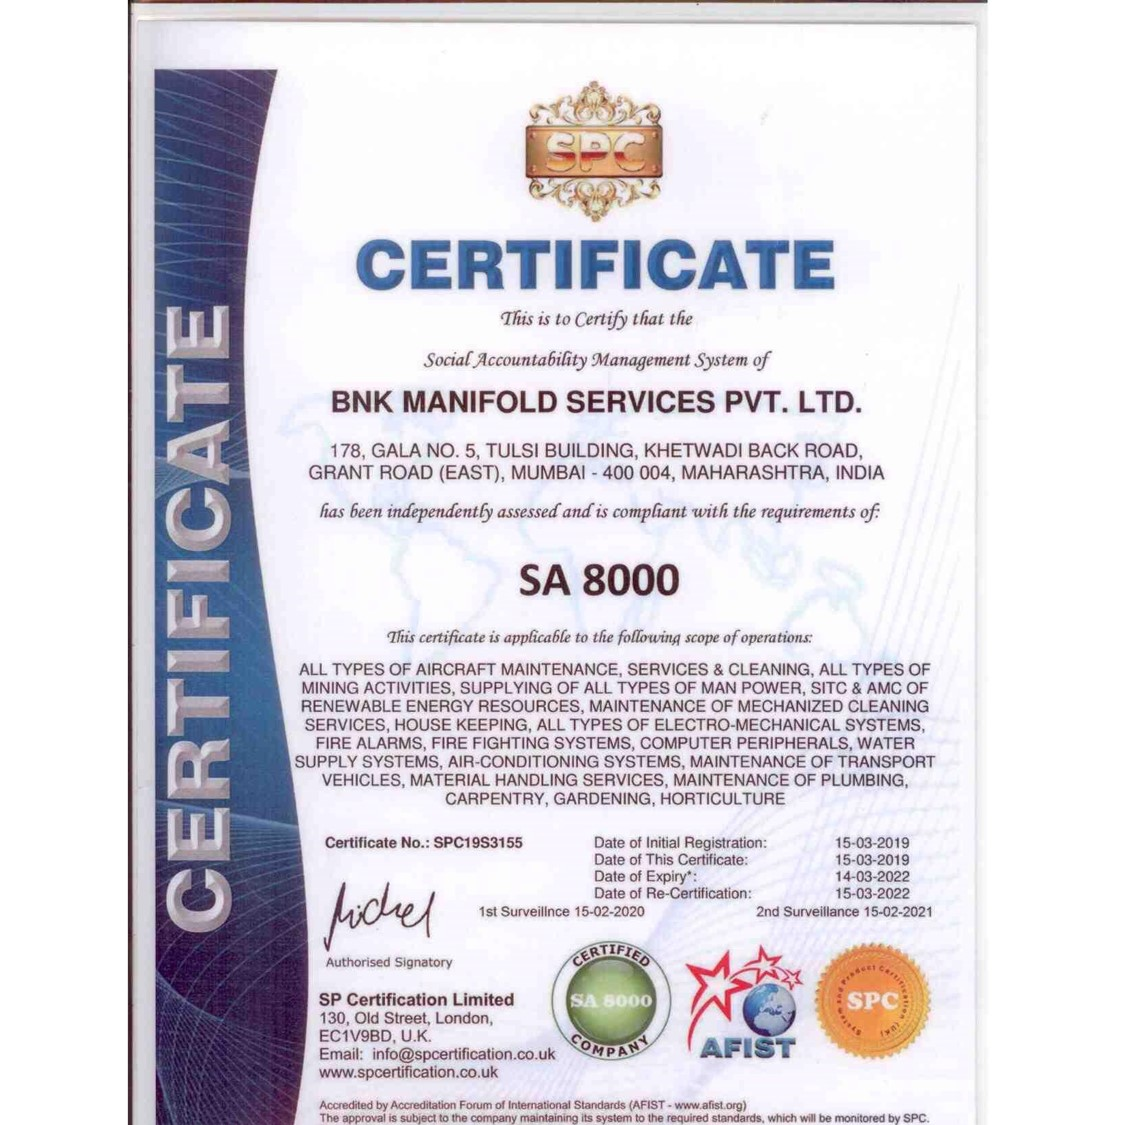 SA 8000 Certificate BNK manifold service